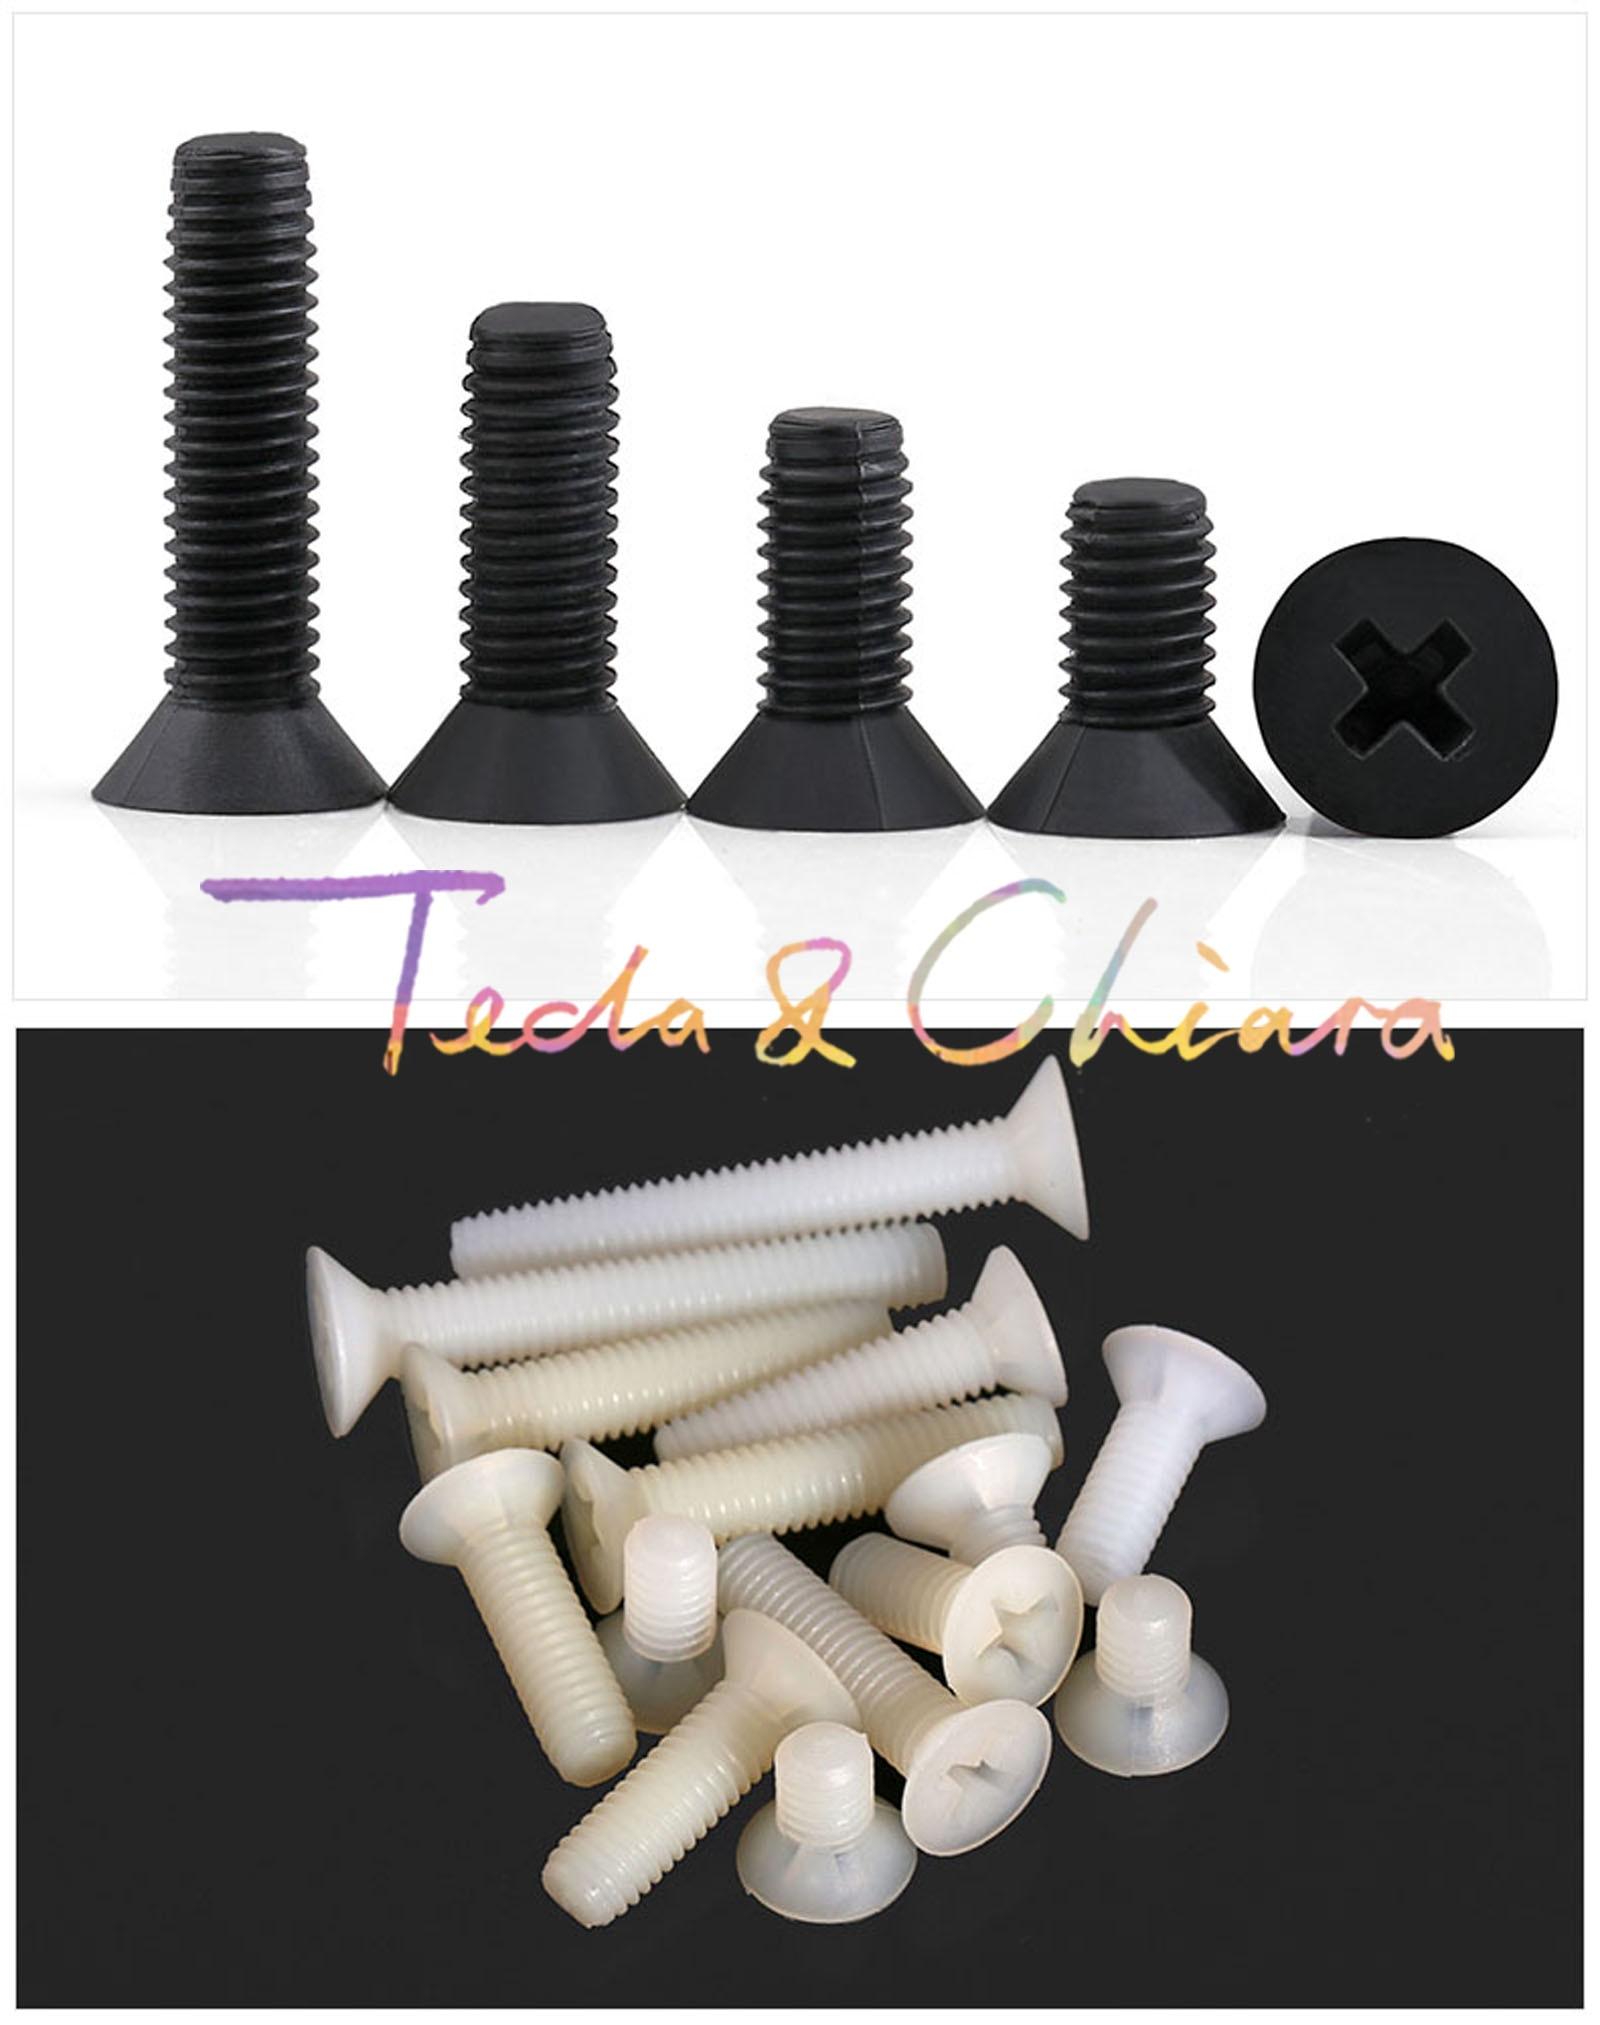 10Pcs M6 x 30mm New L 30 White Black Nylon Machine Phillips Flat Head Cross Recessed Countersunk Head Screw Plastic *